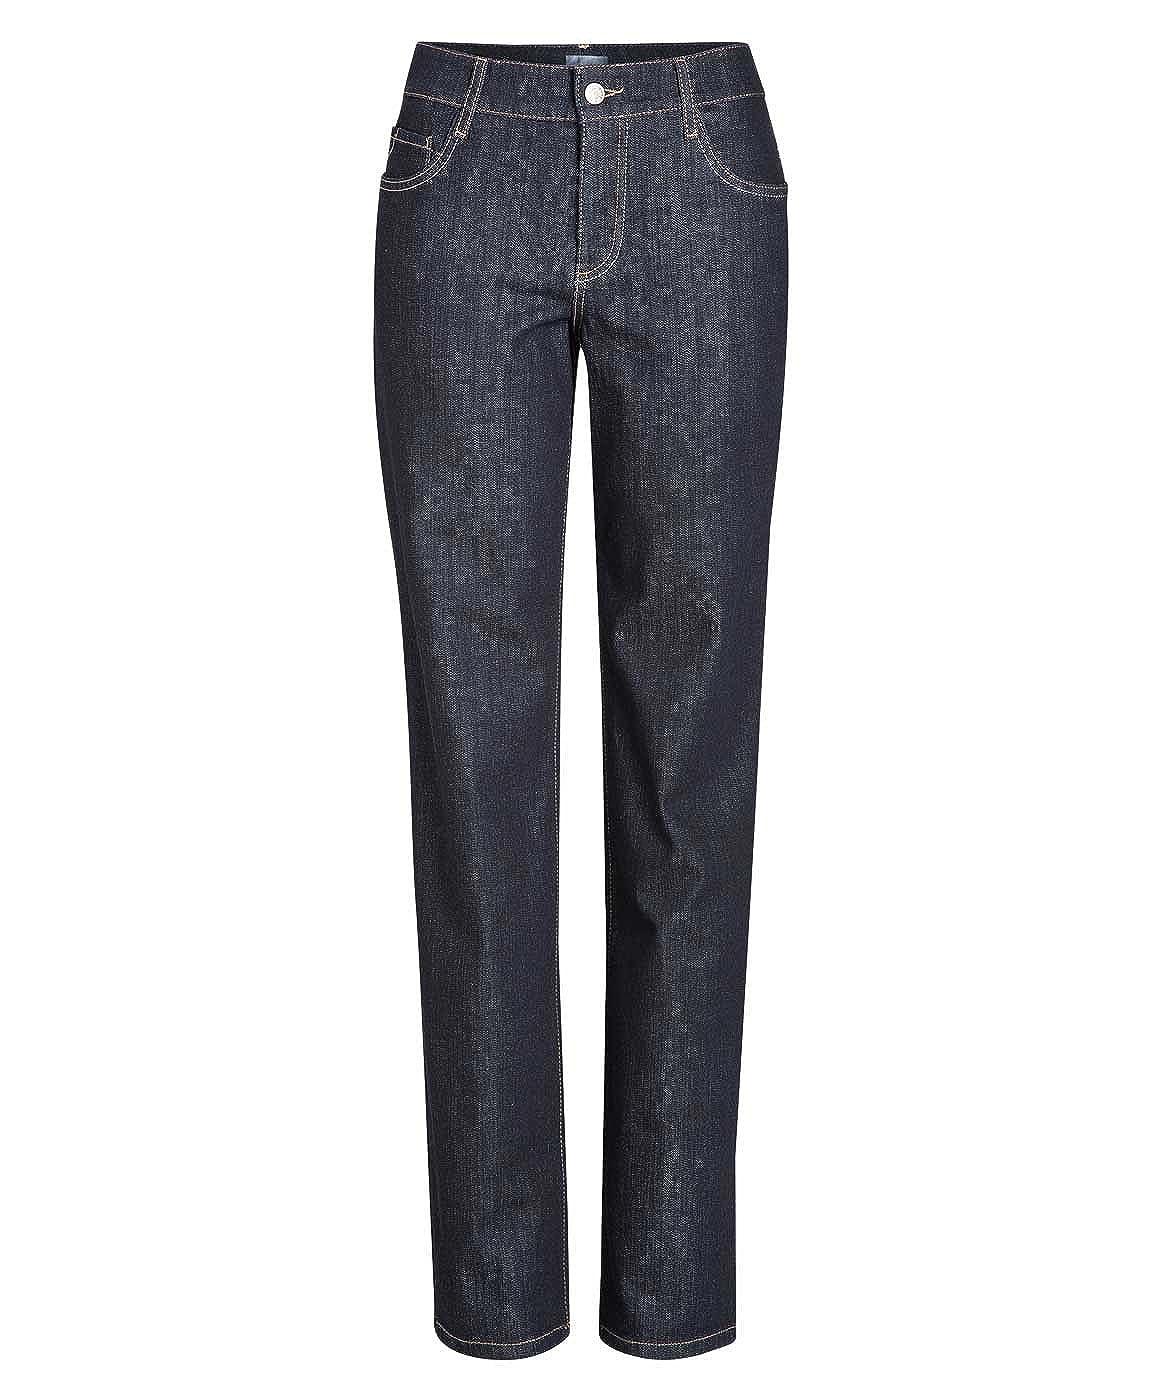 MAC Jeans Gracia Feminine Fit Dark Blue Rinsewash Damen D801 W38 L30